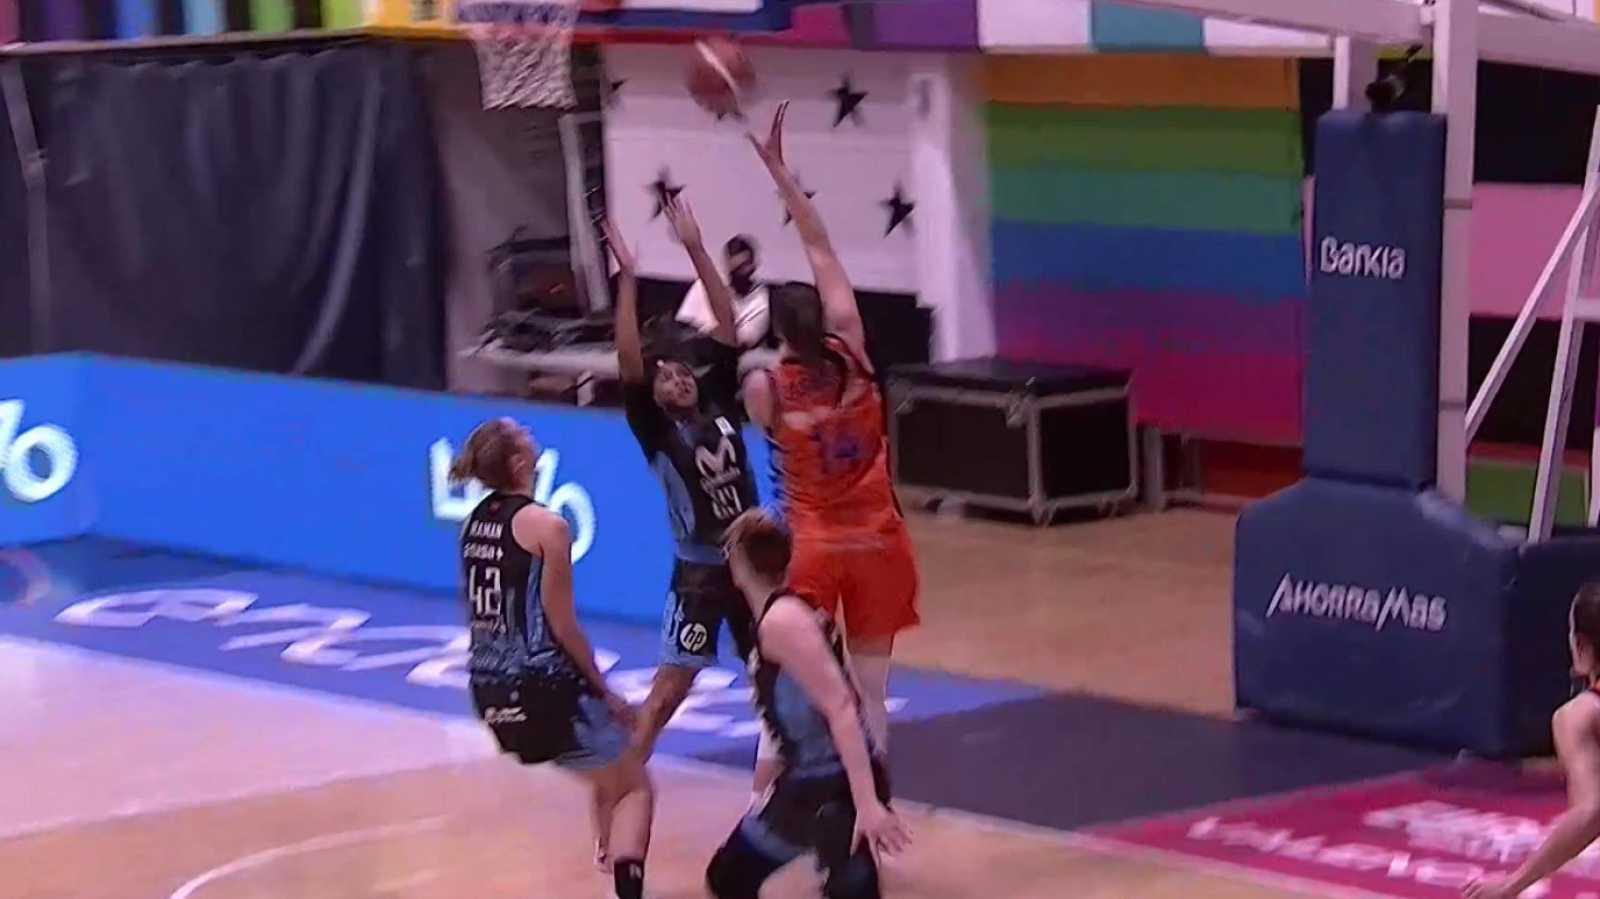 Baloncesto - Liga Femenina Endesa. 29ª jornada: Movistar Estudiantes - Valencia Basket - ver ahora